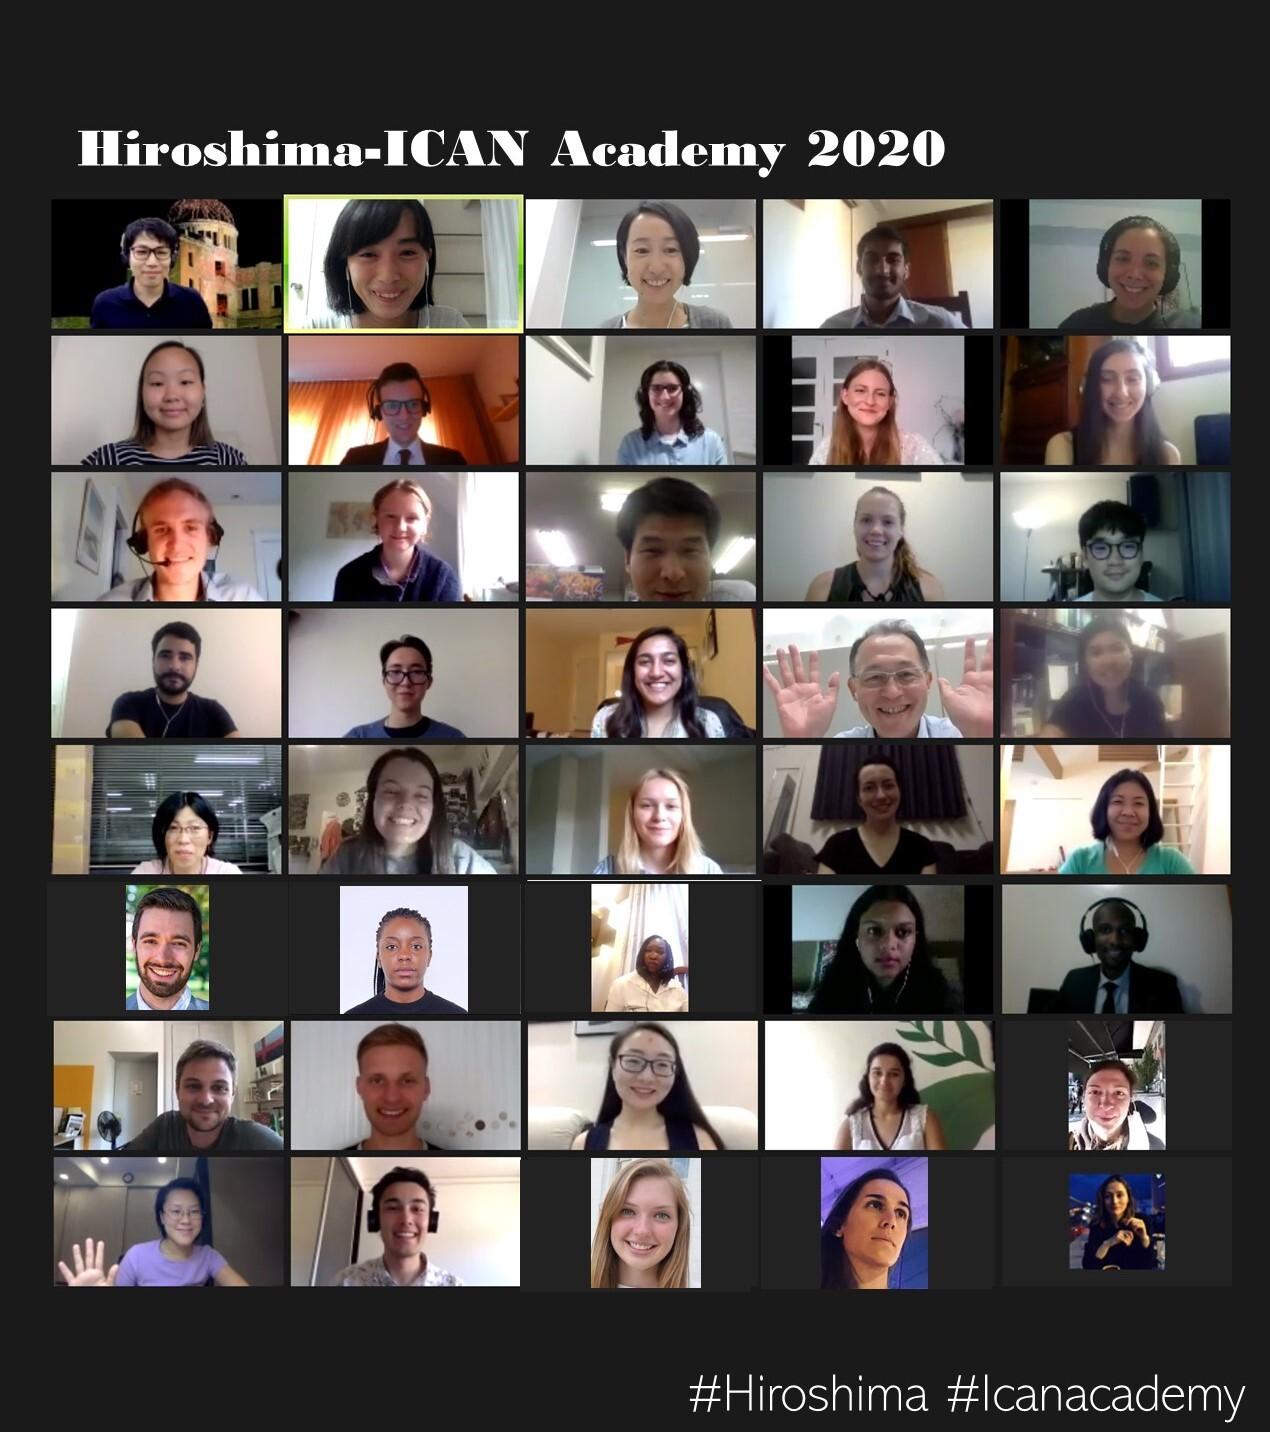 2020_academy_Orientation-groupphoto_0713.jpg